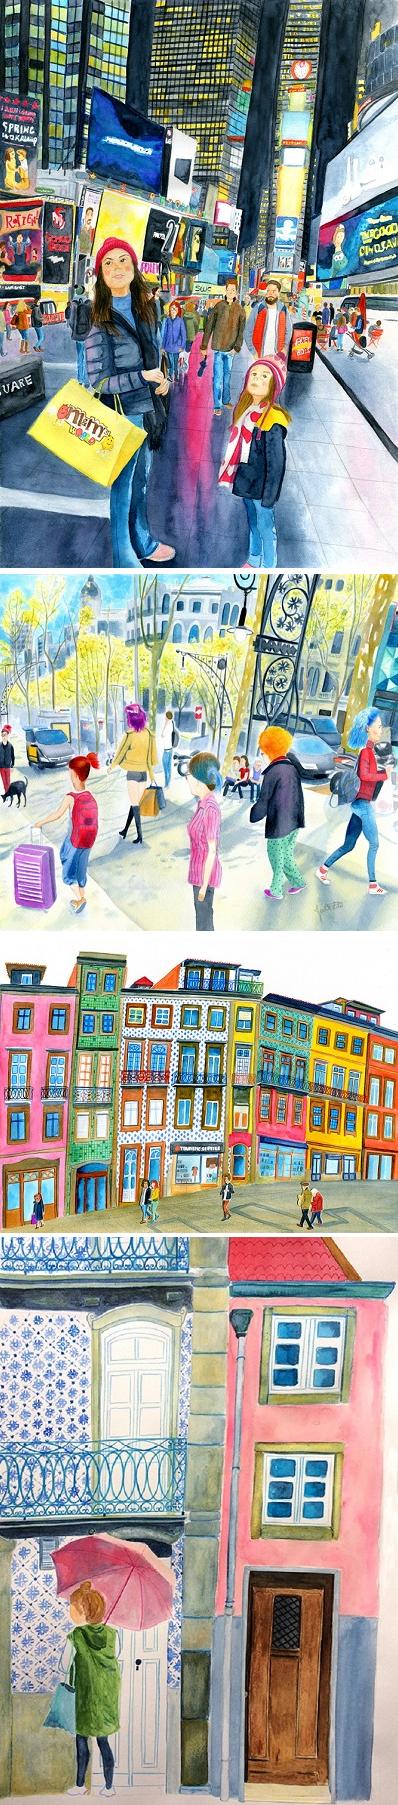 Illustrations of City Life by Ju Castelo